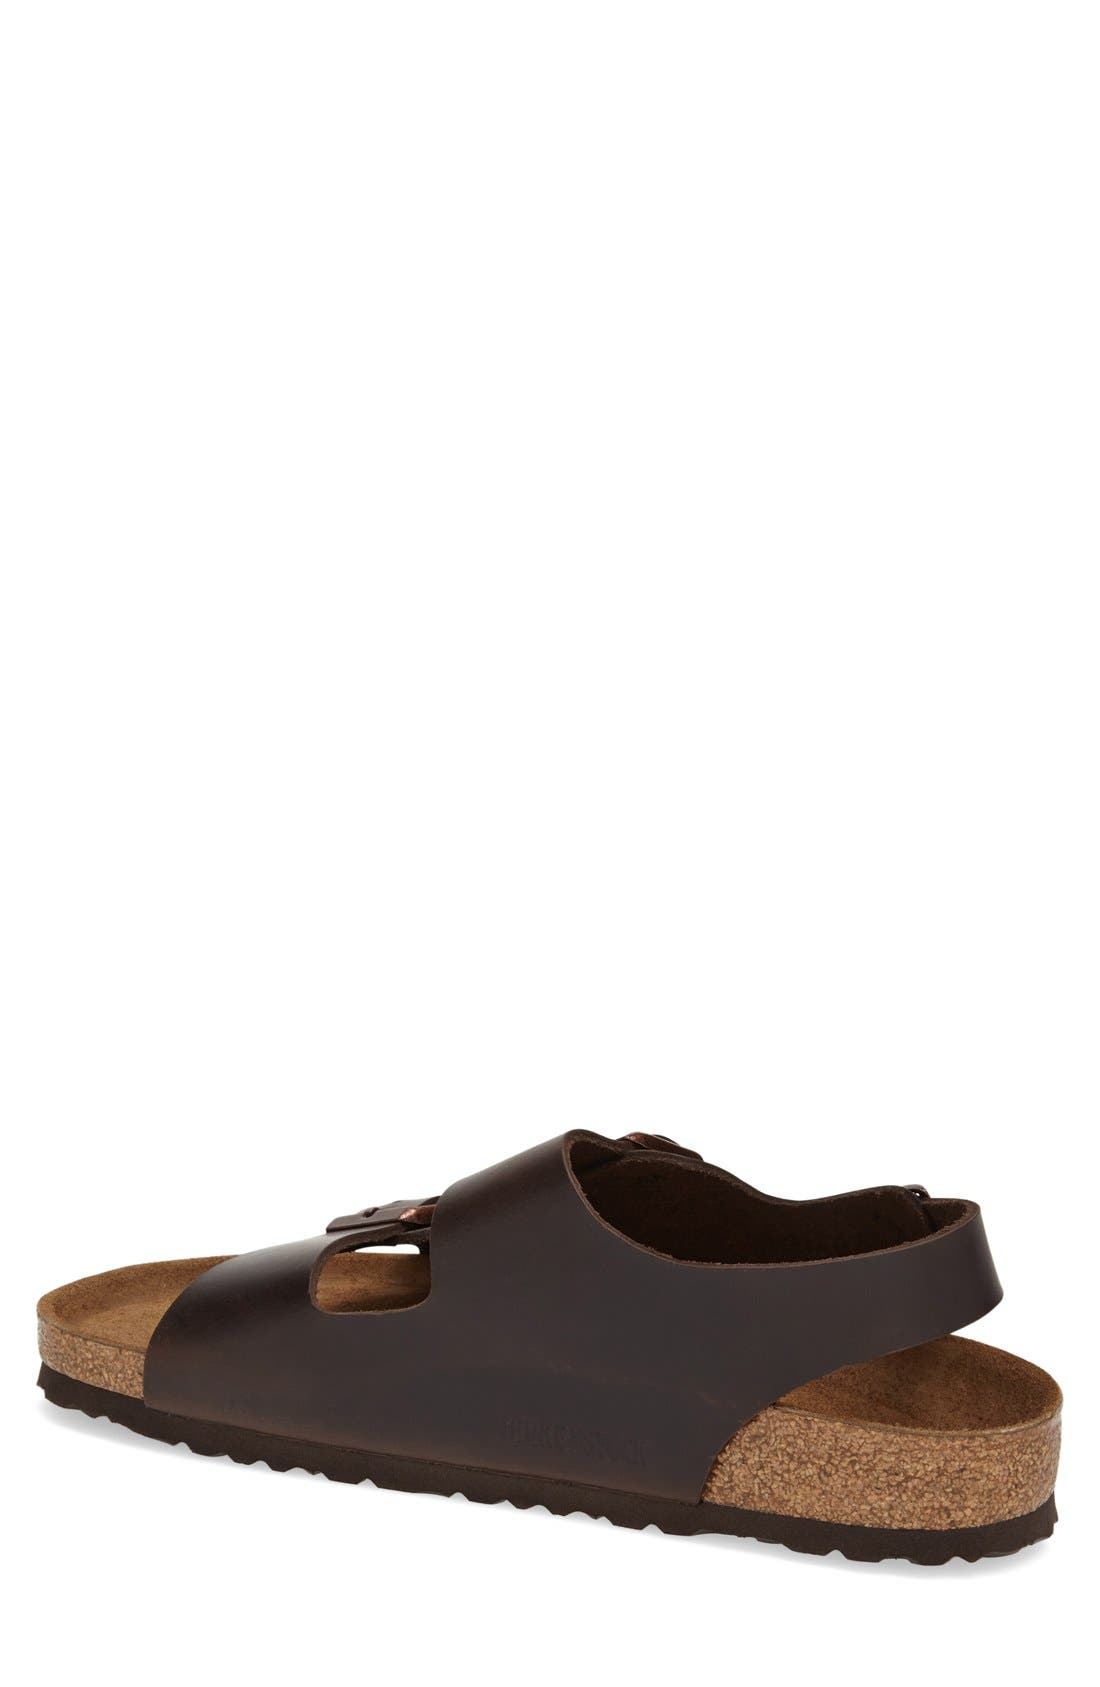 BIRKENSTOCK, 'Milano' Soft Footbed Sandal, Alternate thumbnail 2, color, AMALFI BROWN